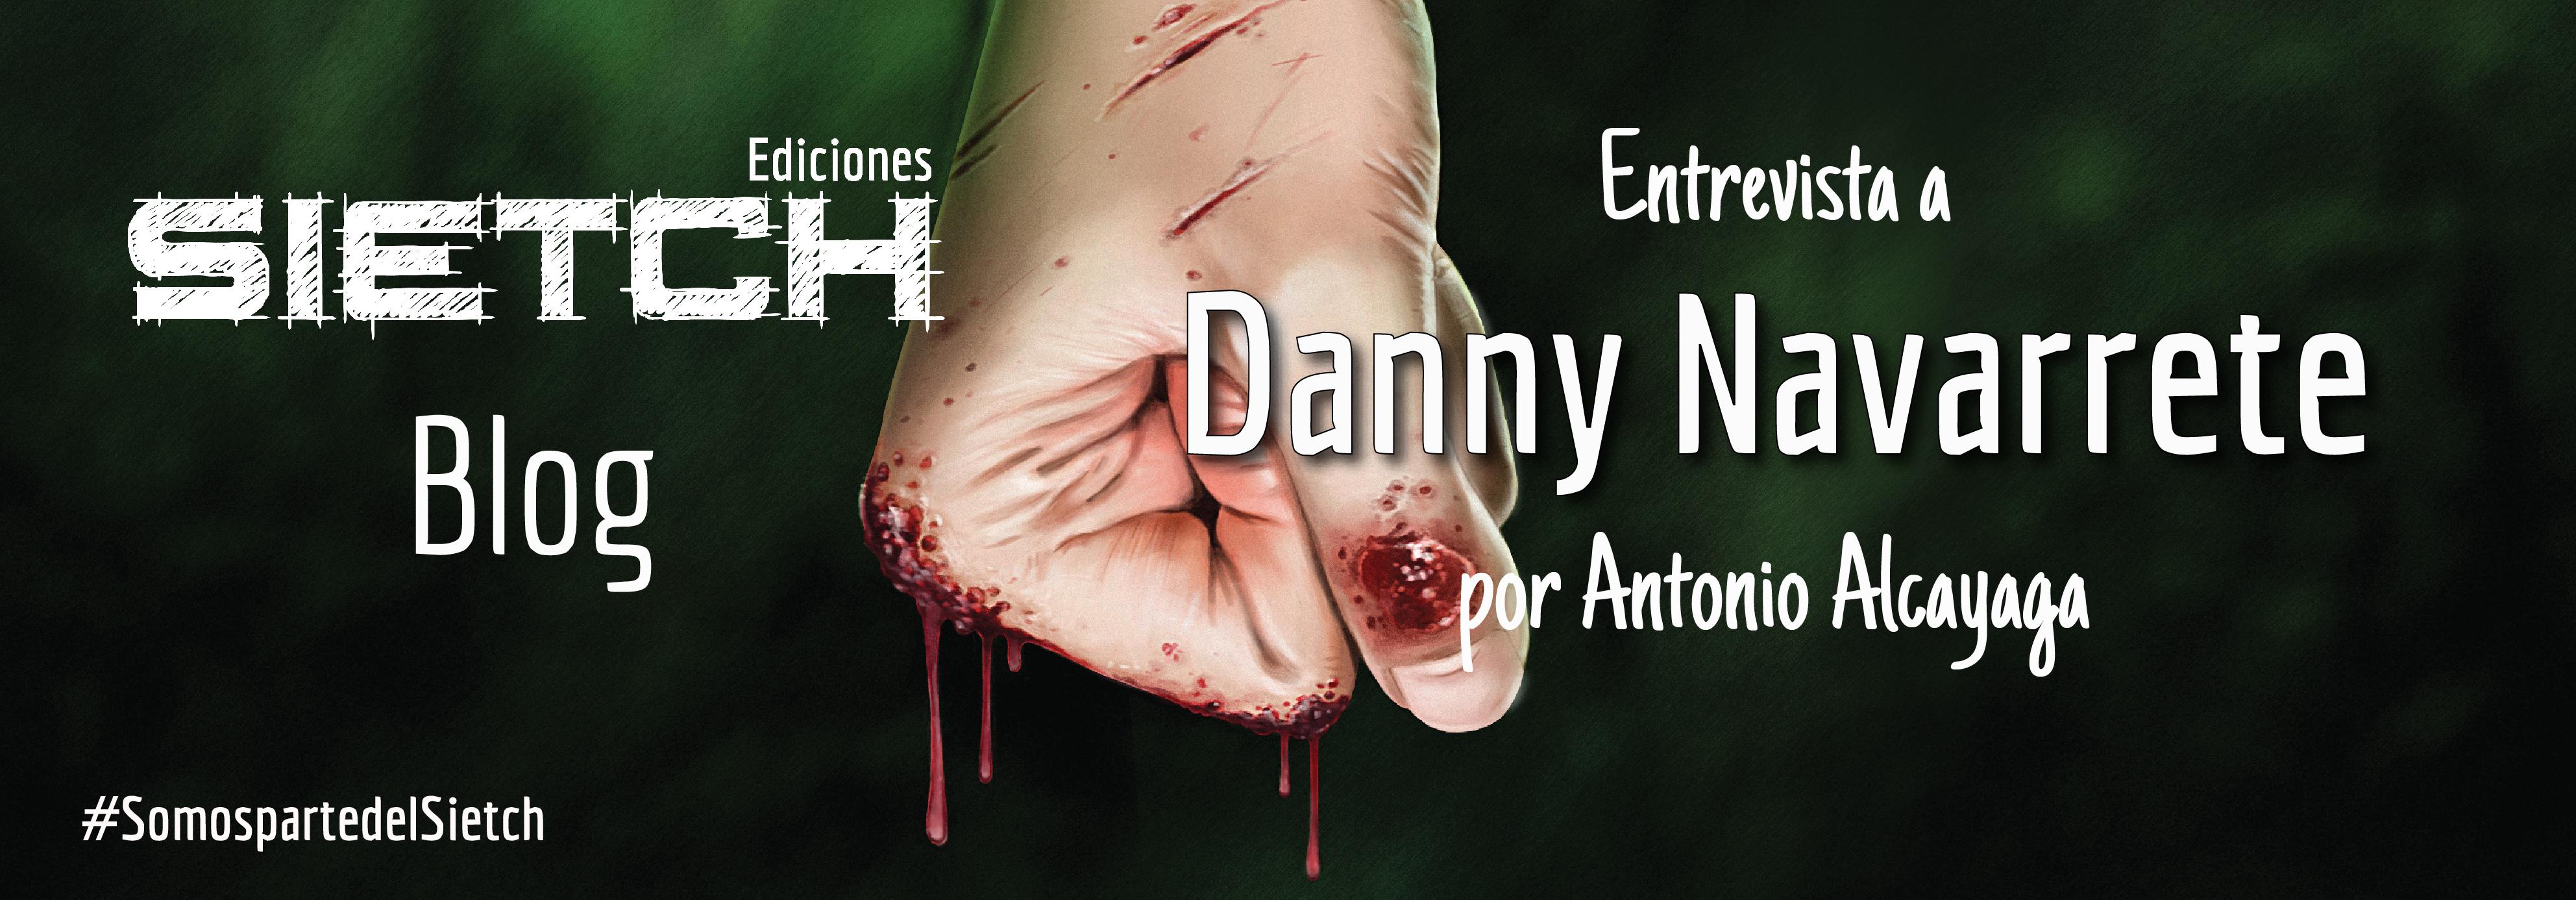 Entrevista a Danny Navarrete